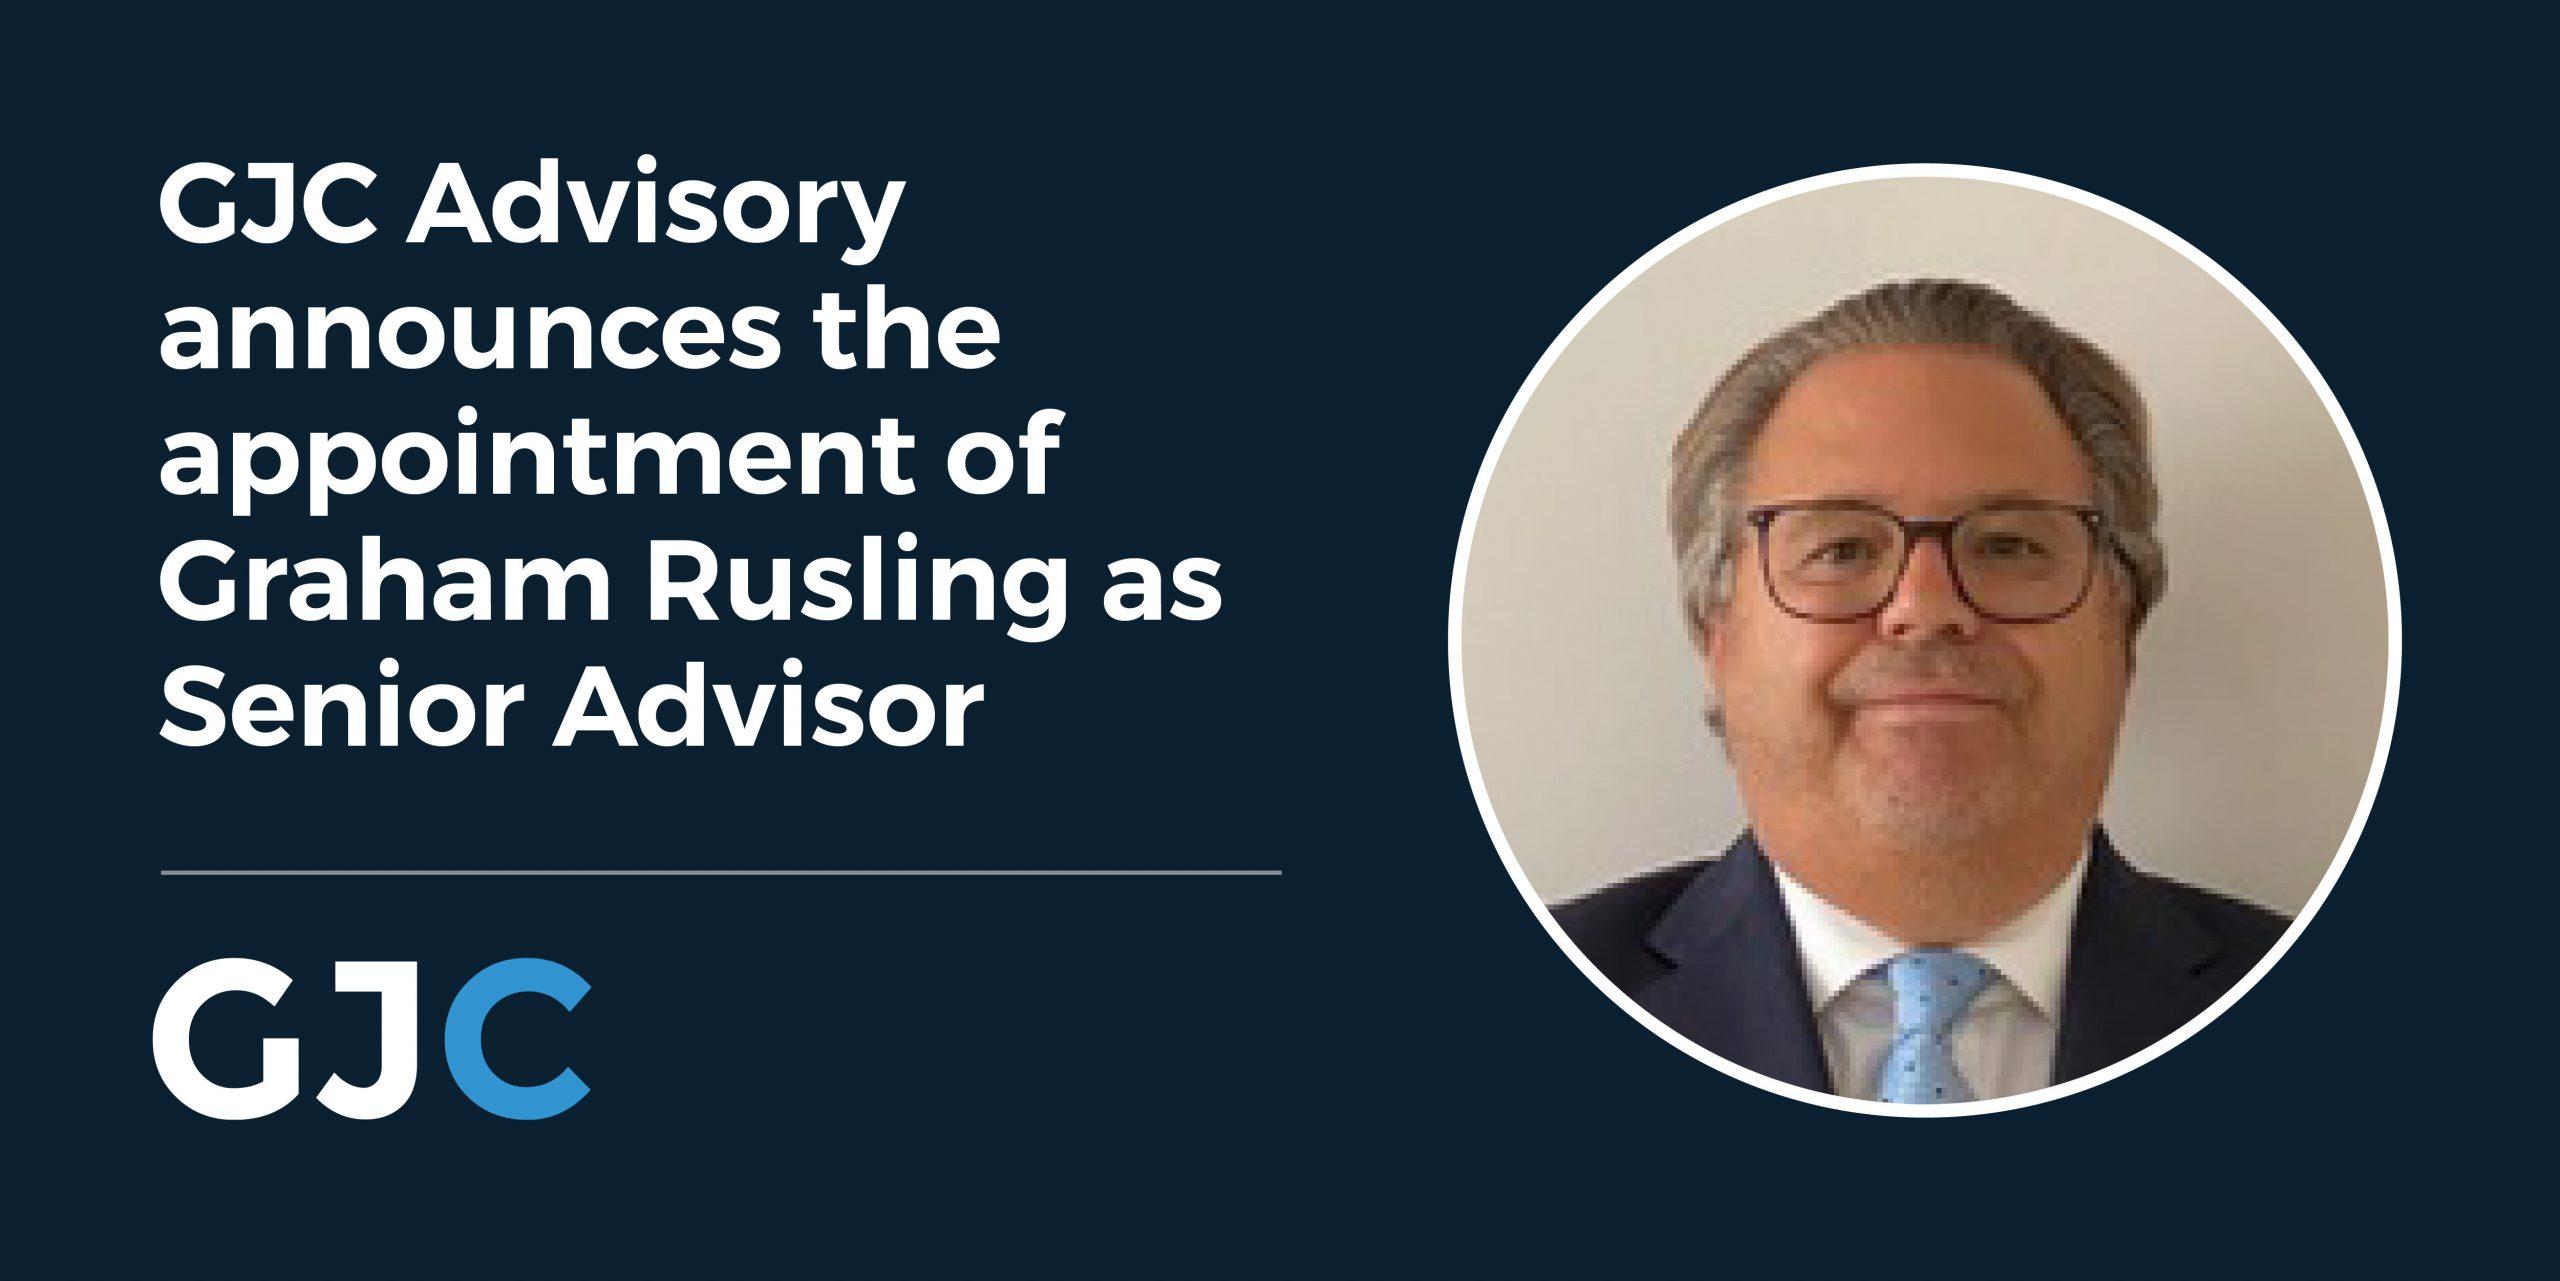 GJC Advisory announces the appointment of Graham Rusling as Senior Advisor